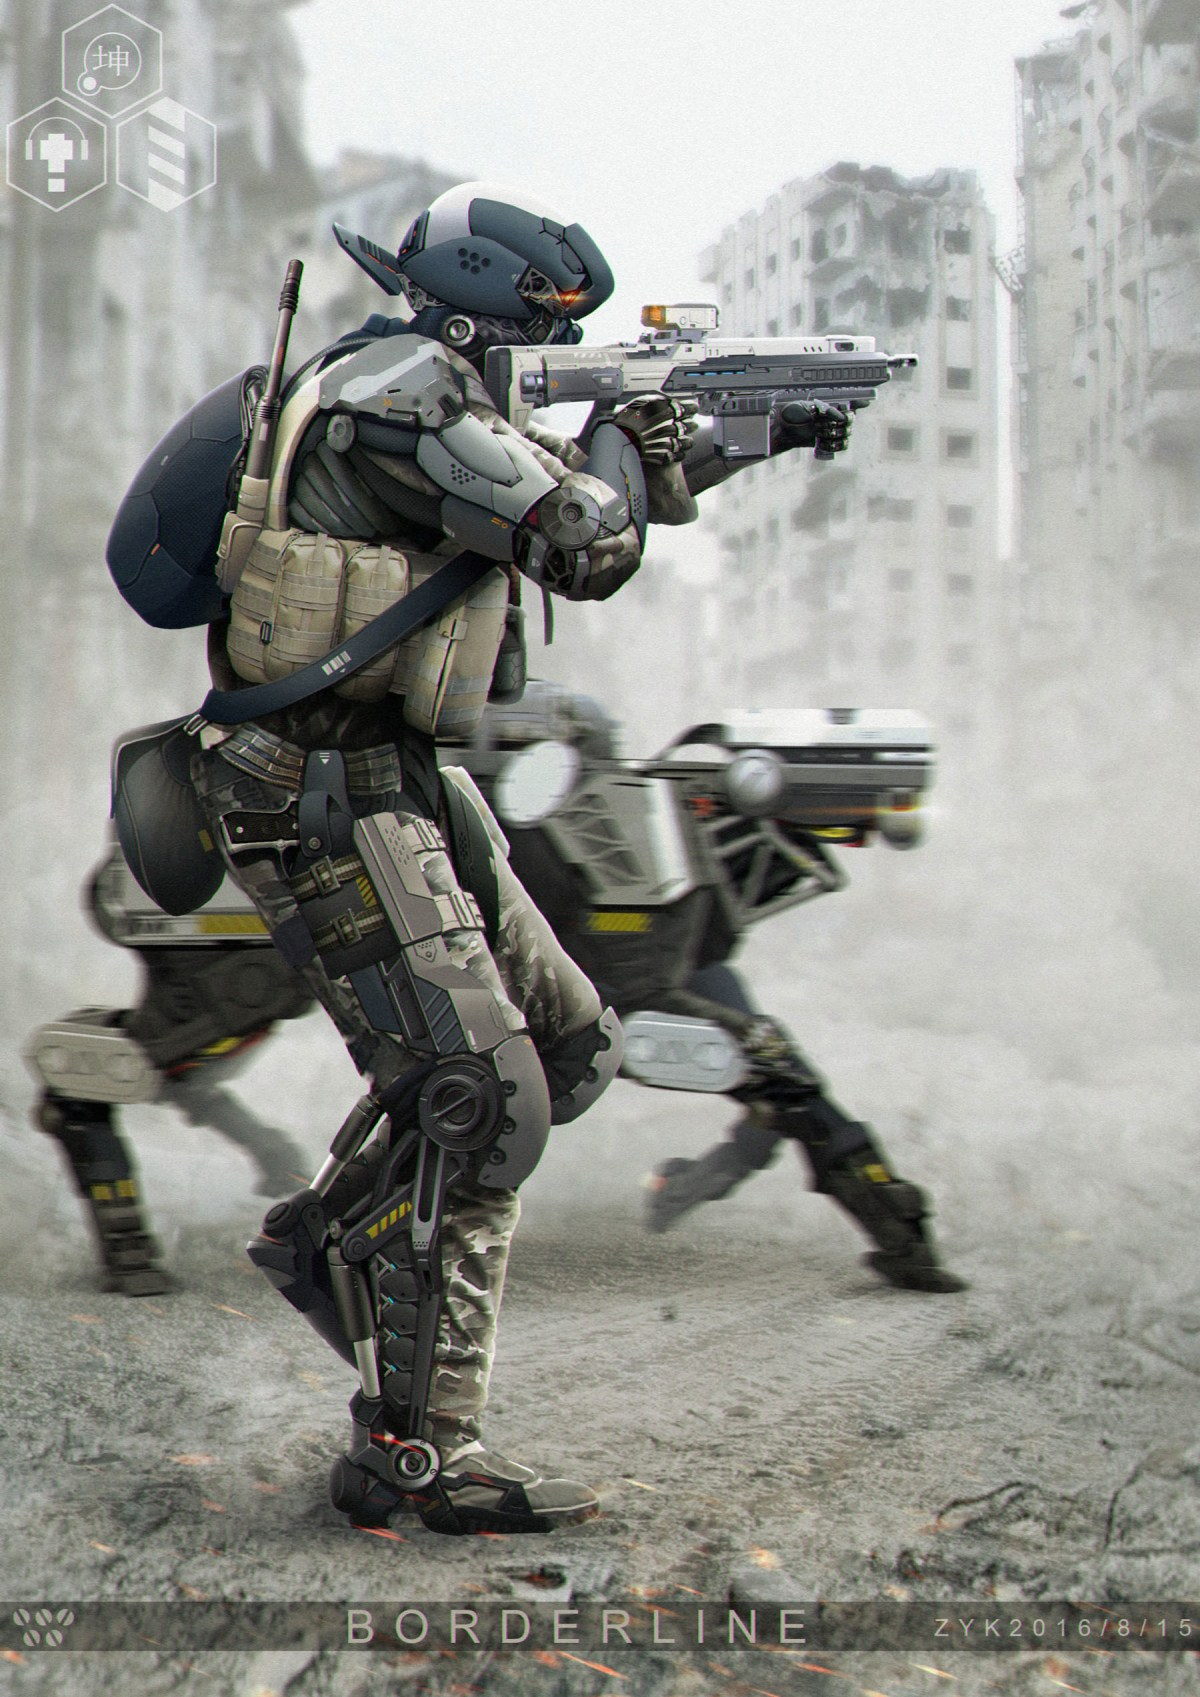 Futuristic Soldier Concept Art by Zhu Yukun on Artstation